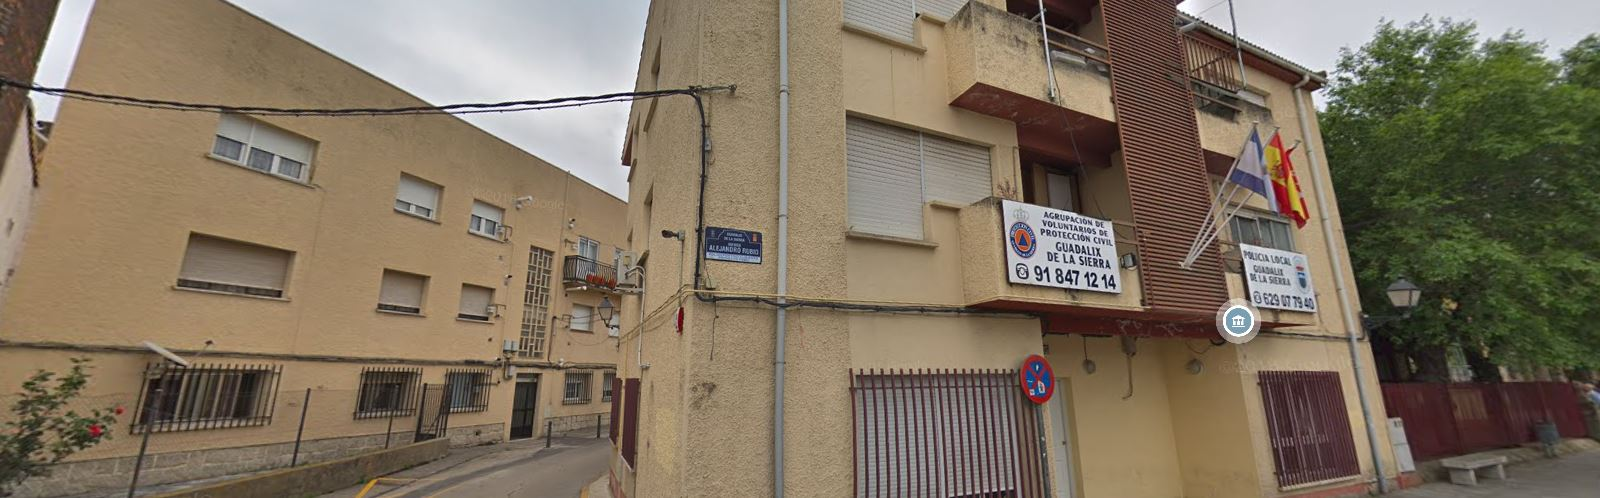 Registro civil - Juzgado de Paz Guadalix de la Sierra